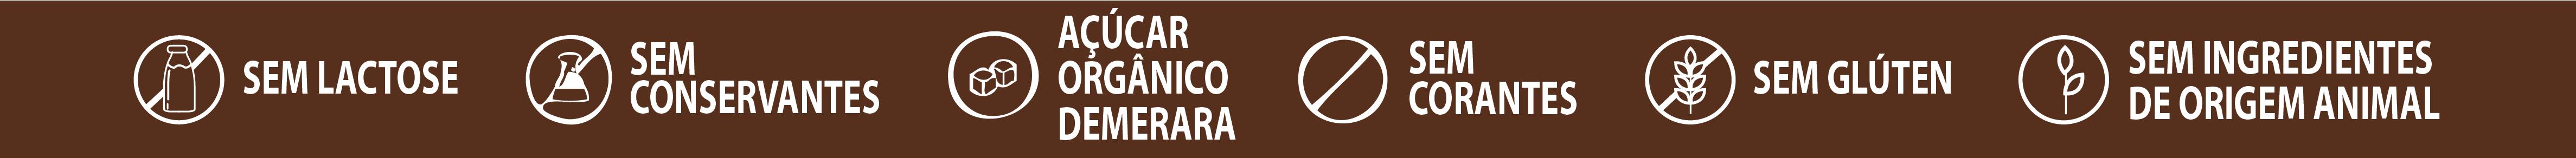 banner food service